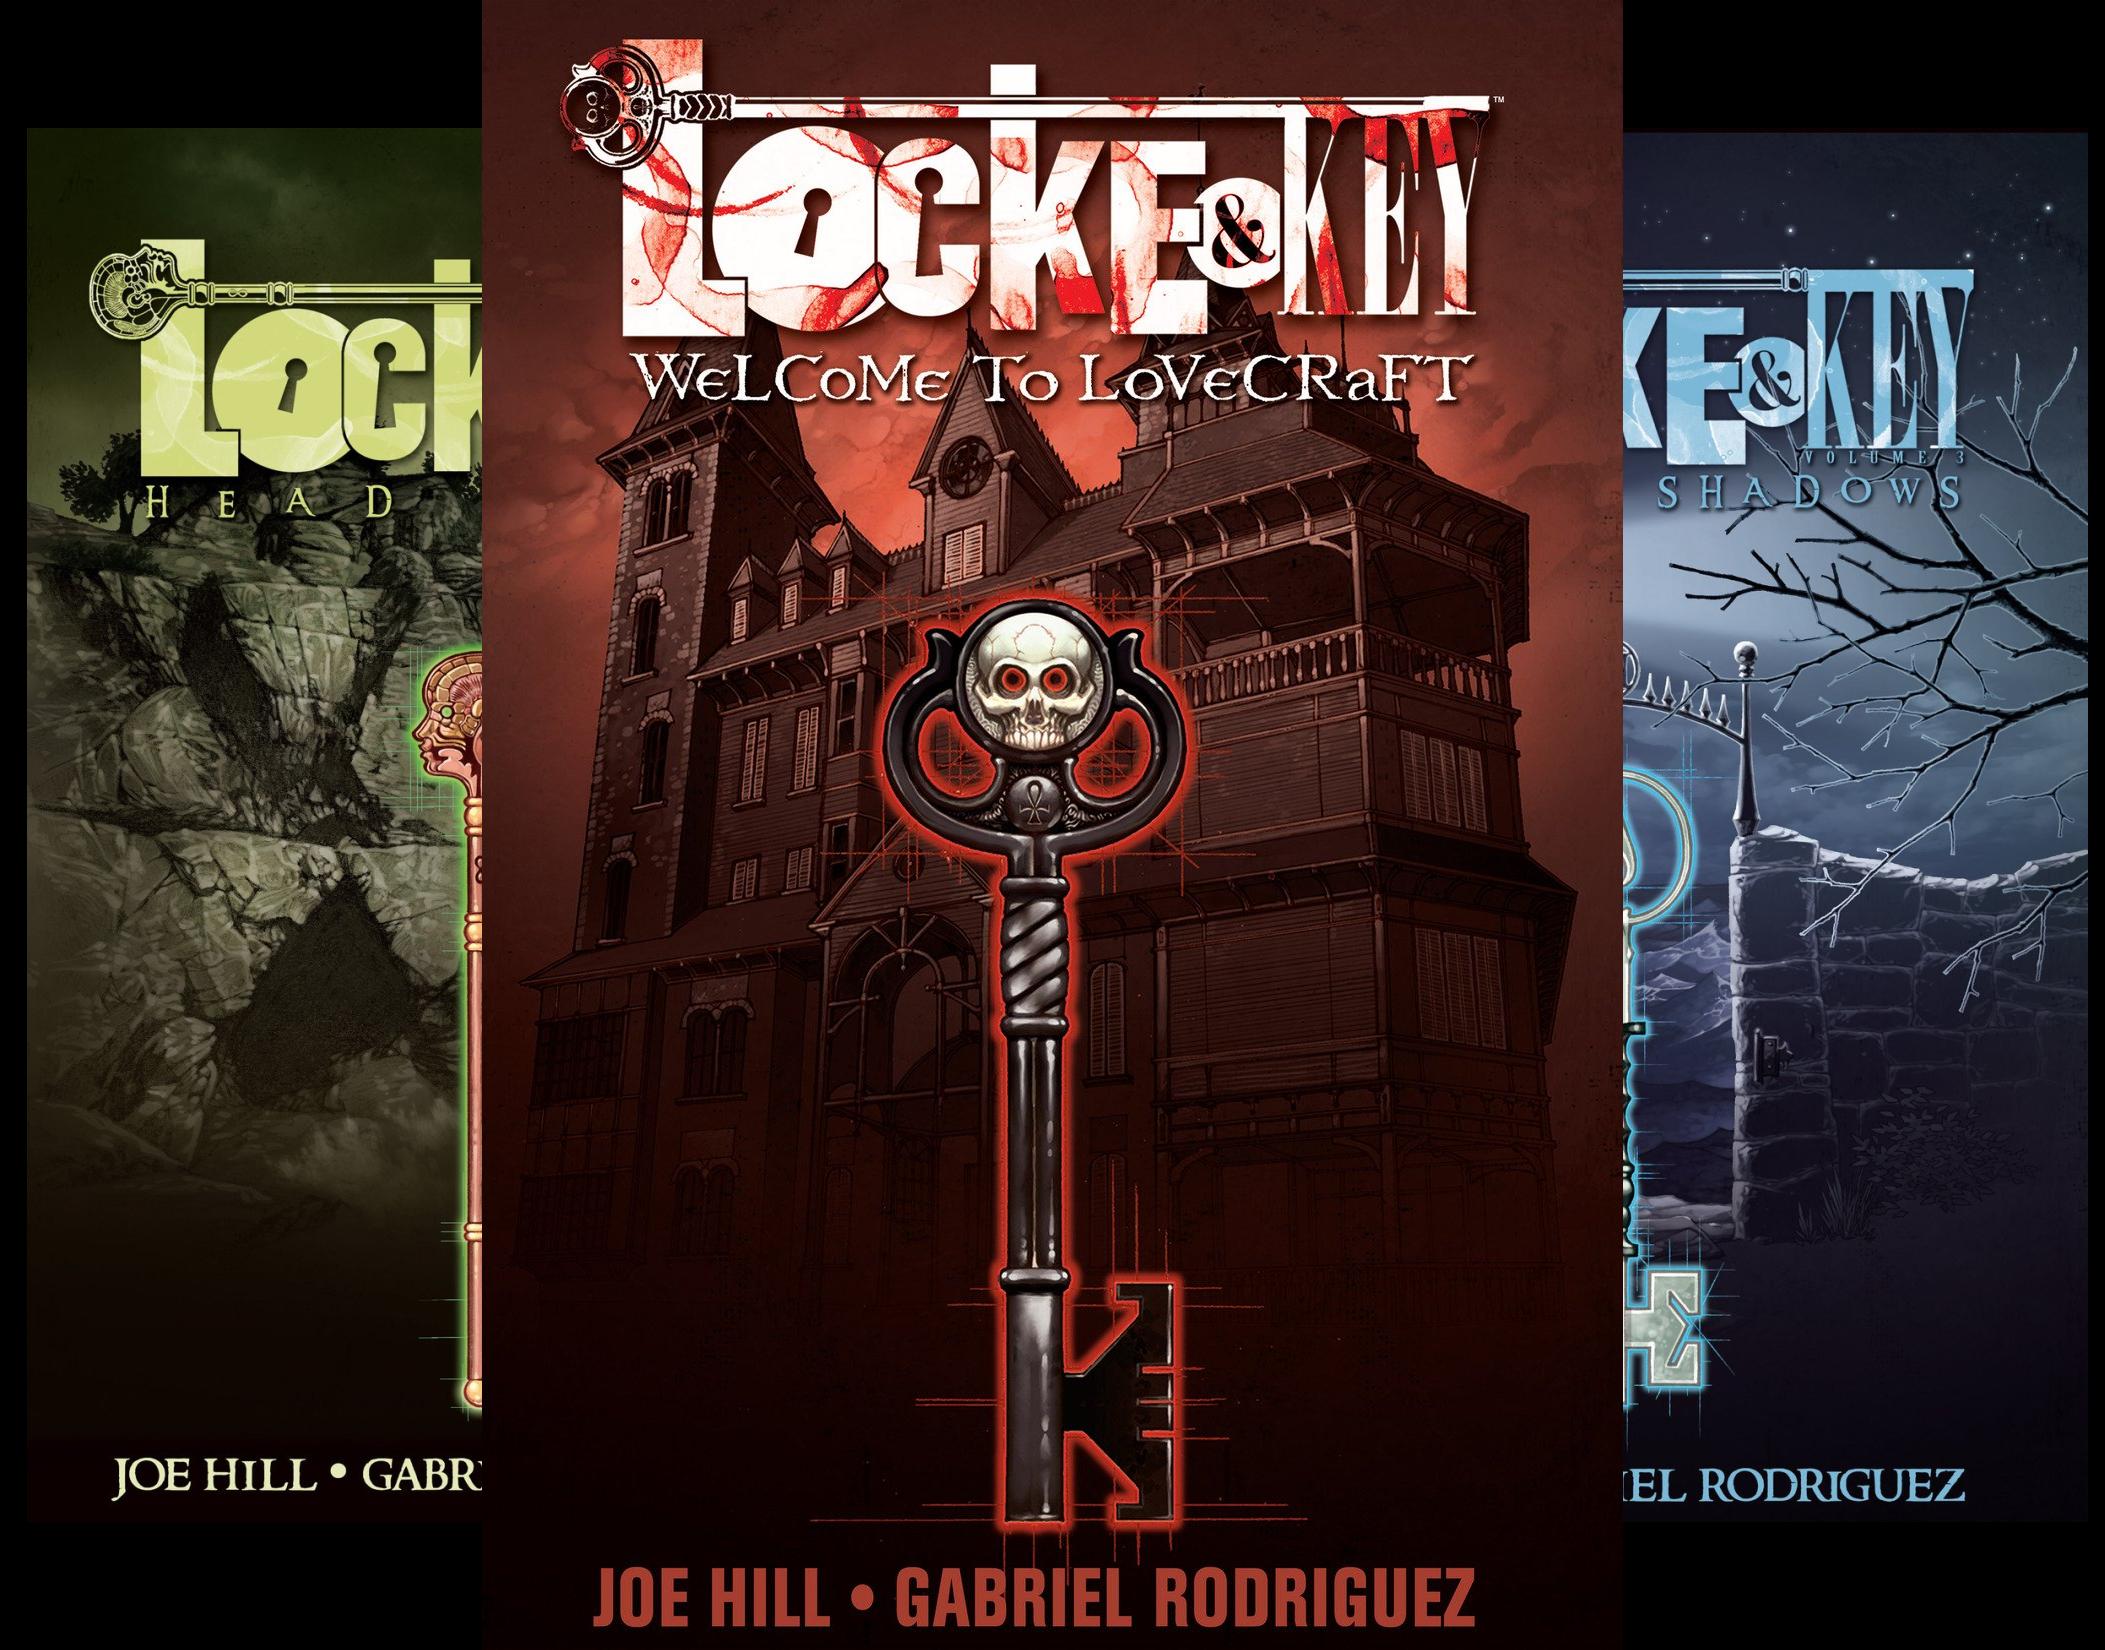 Locke n key master edition volume 1 ebook locke u0026 key vol array locke u0026 key slipcase set joe hill gabriel rodriguez 0783324858433 rh fandeluxe Image collections